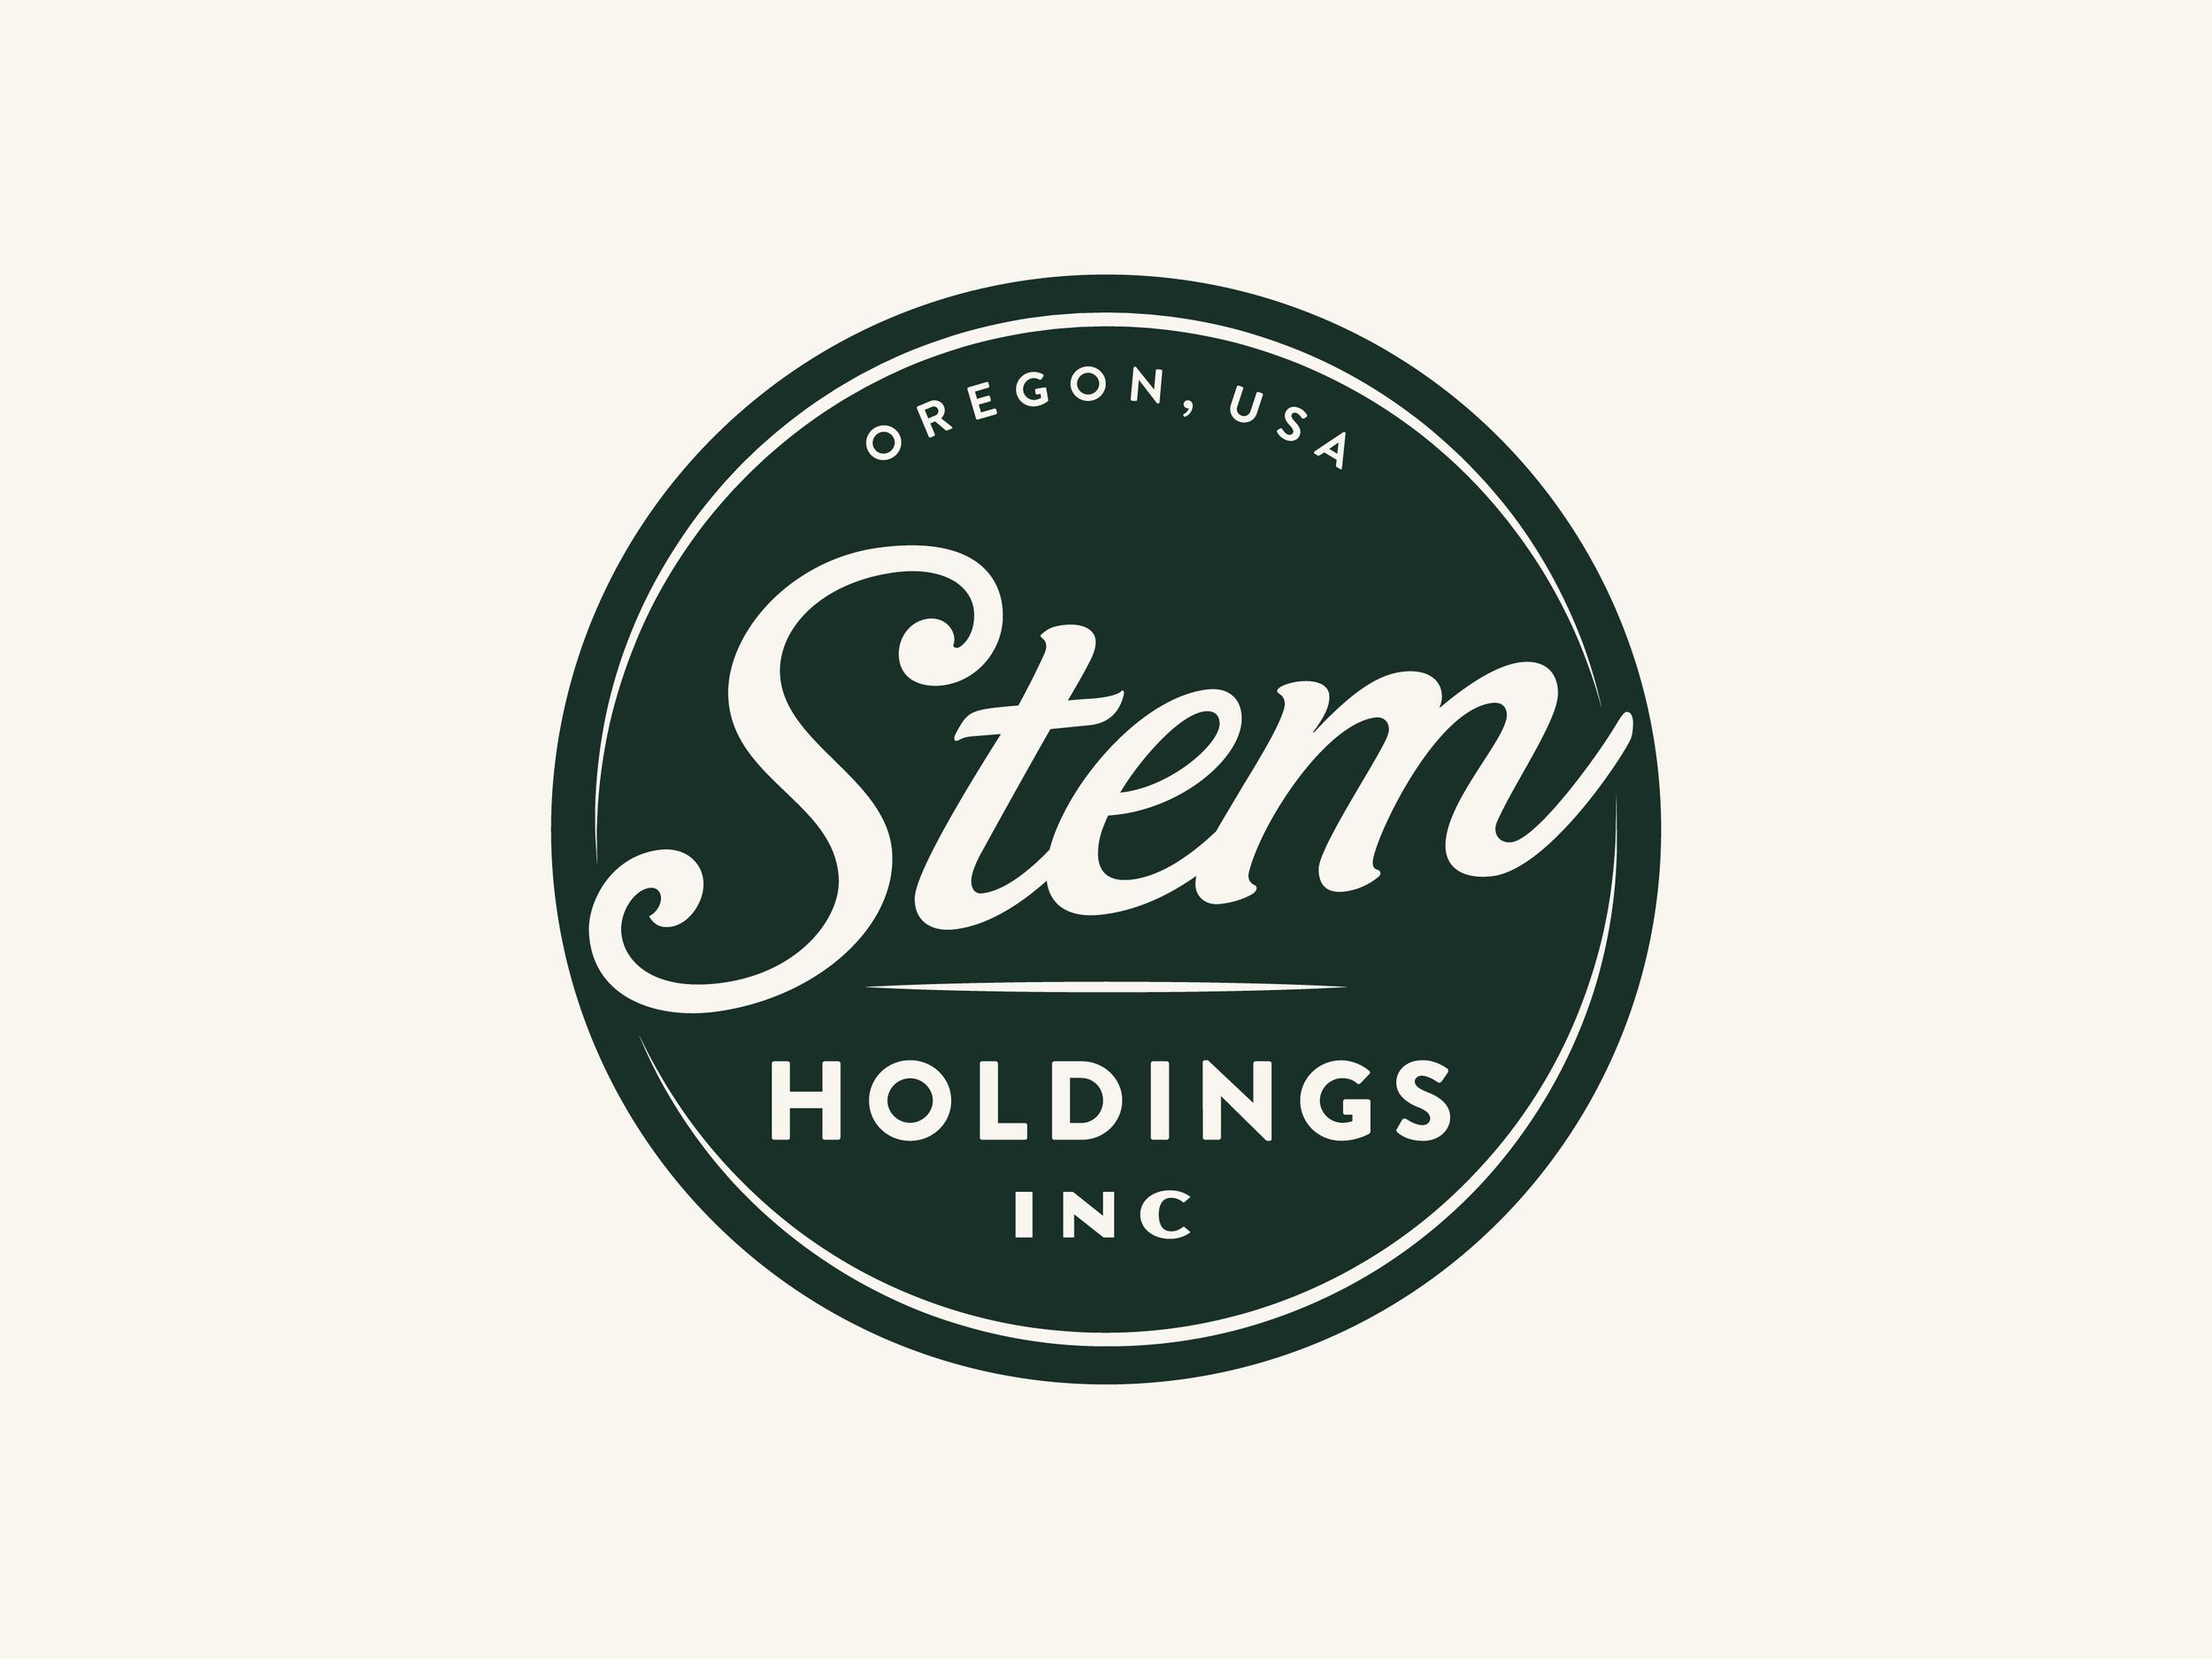 StemHoldings-Cannabis-Branding-Logo